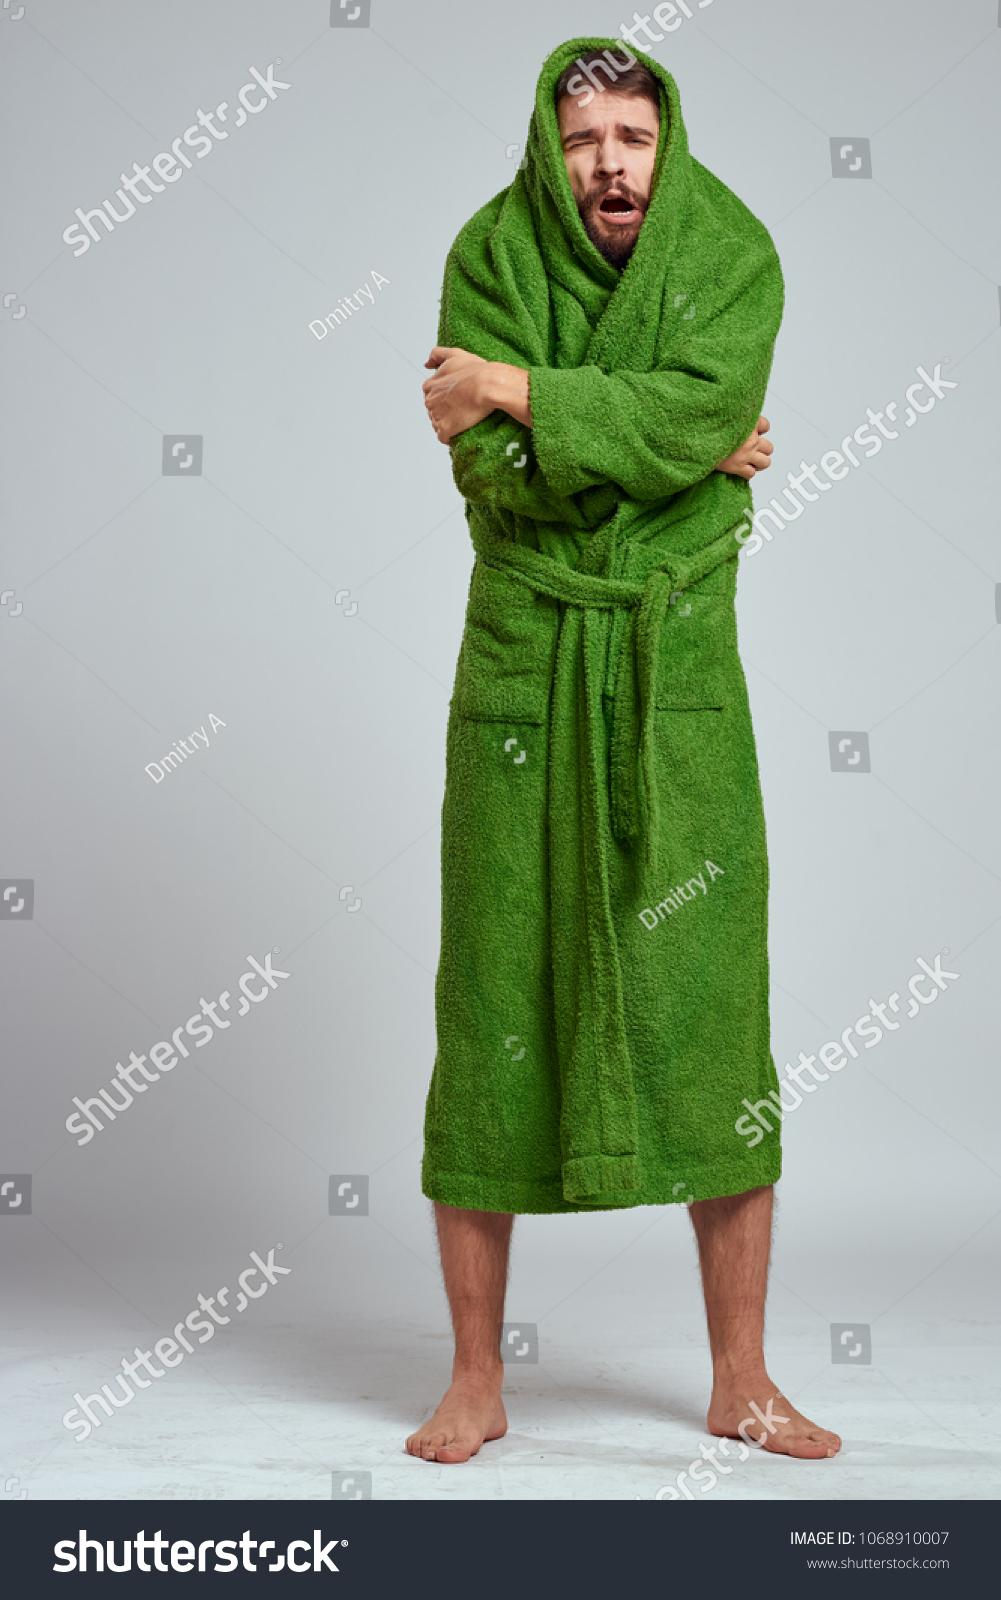 64b84aa378 Man green robe froze stock photo edit now shutterstock jpg 1001x1600 Green monk  robe